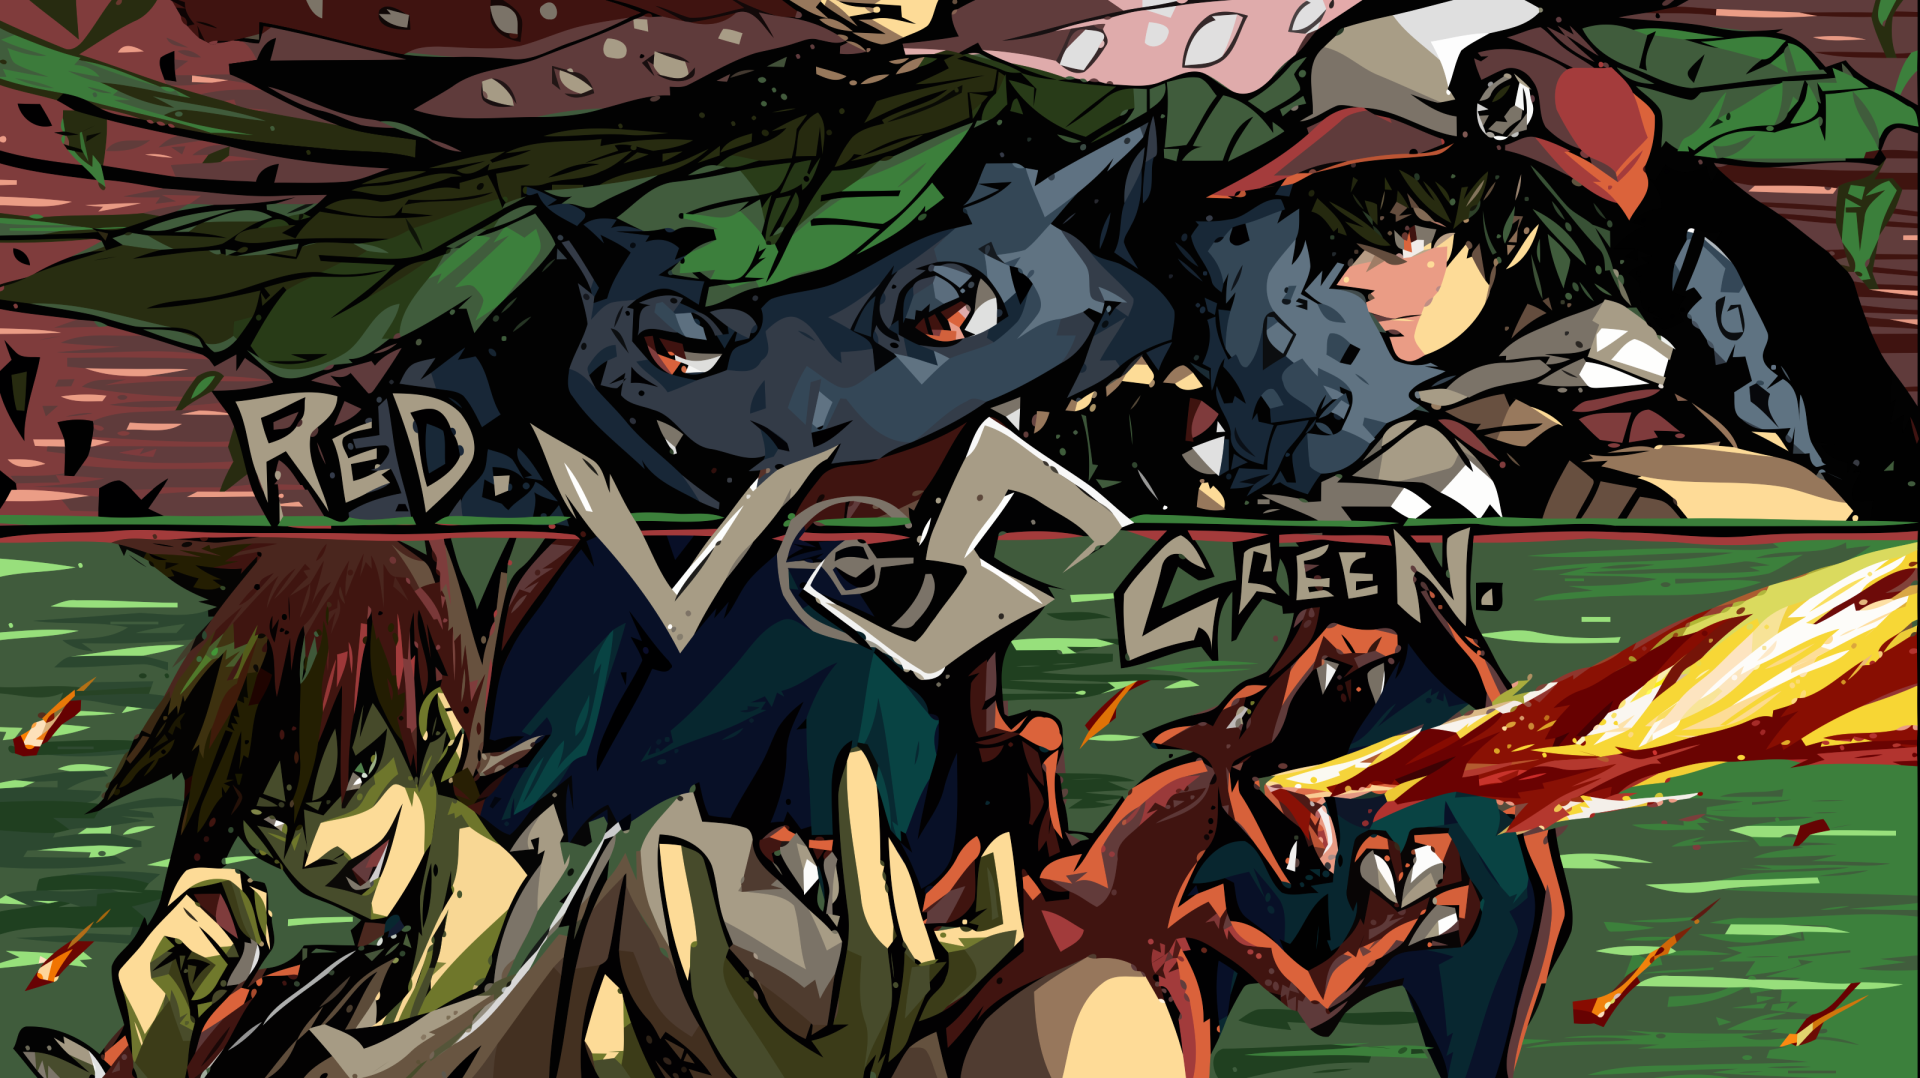 Anime - Pokémon  Venusaur (Pokémon) Red (Pokémon) Green (Pokémon) Charizard (Pokémon) Wallpaper